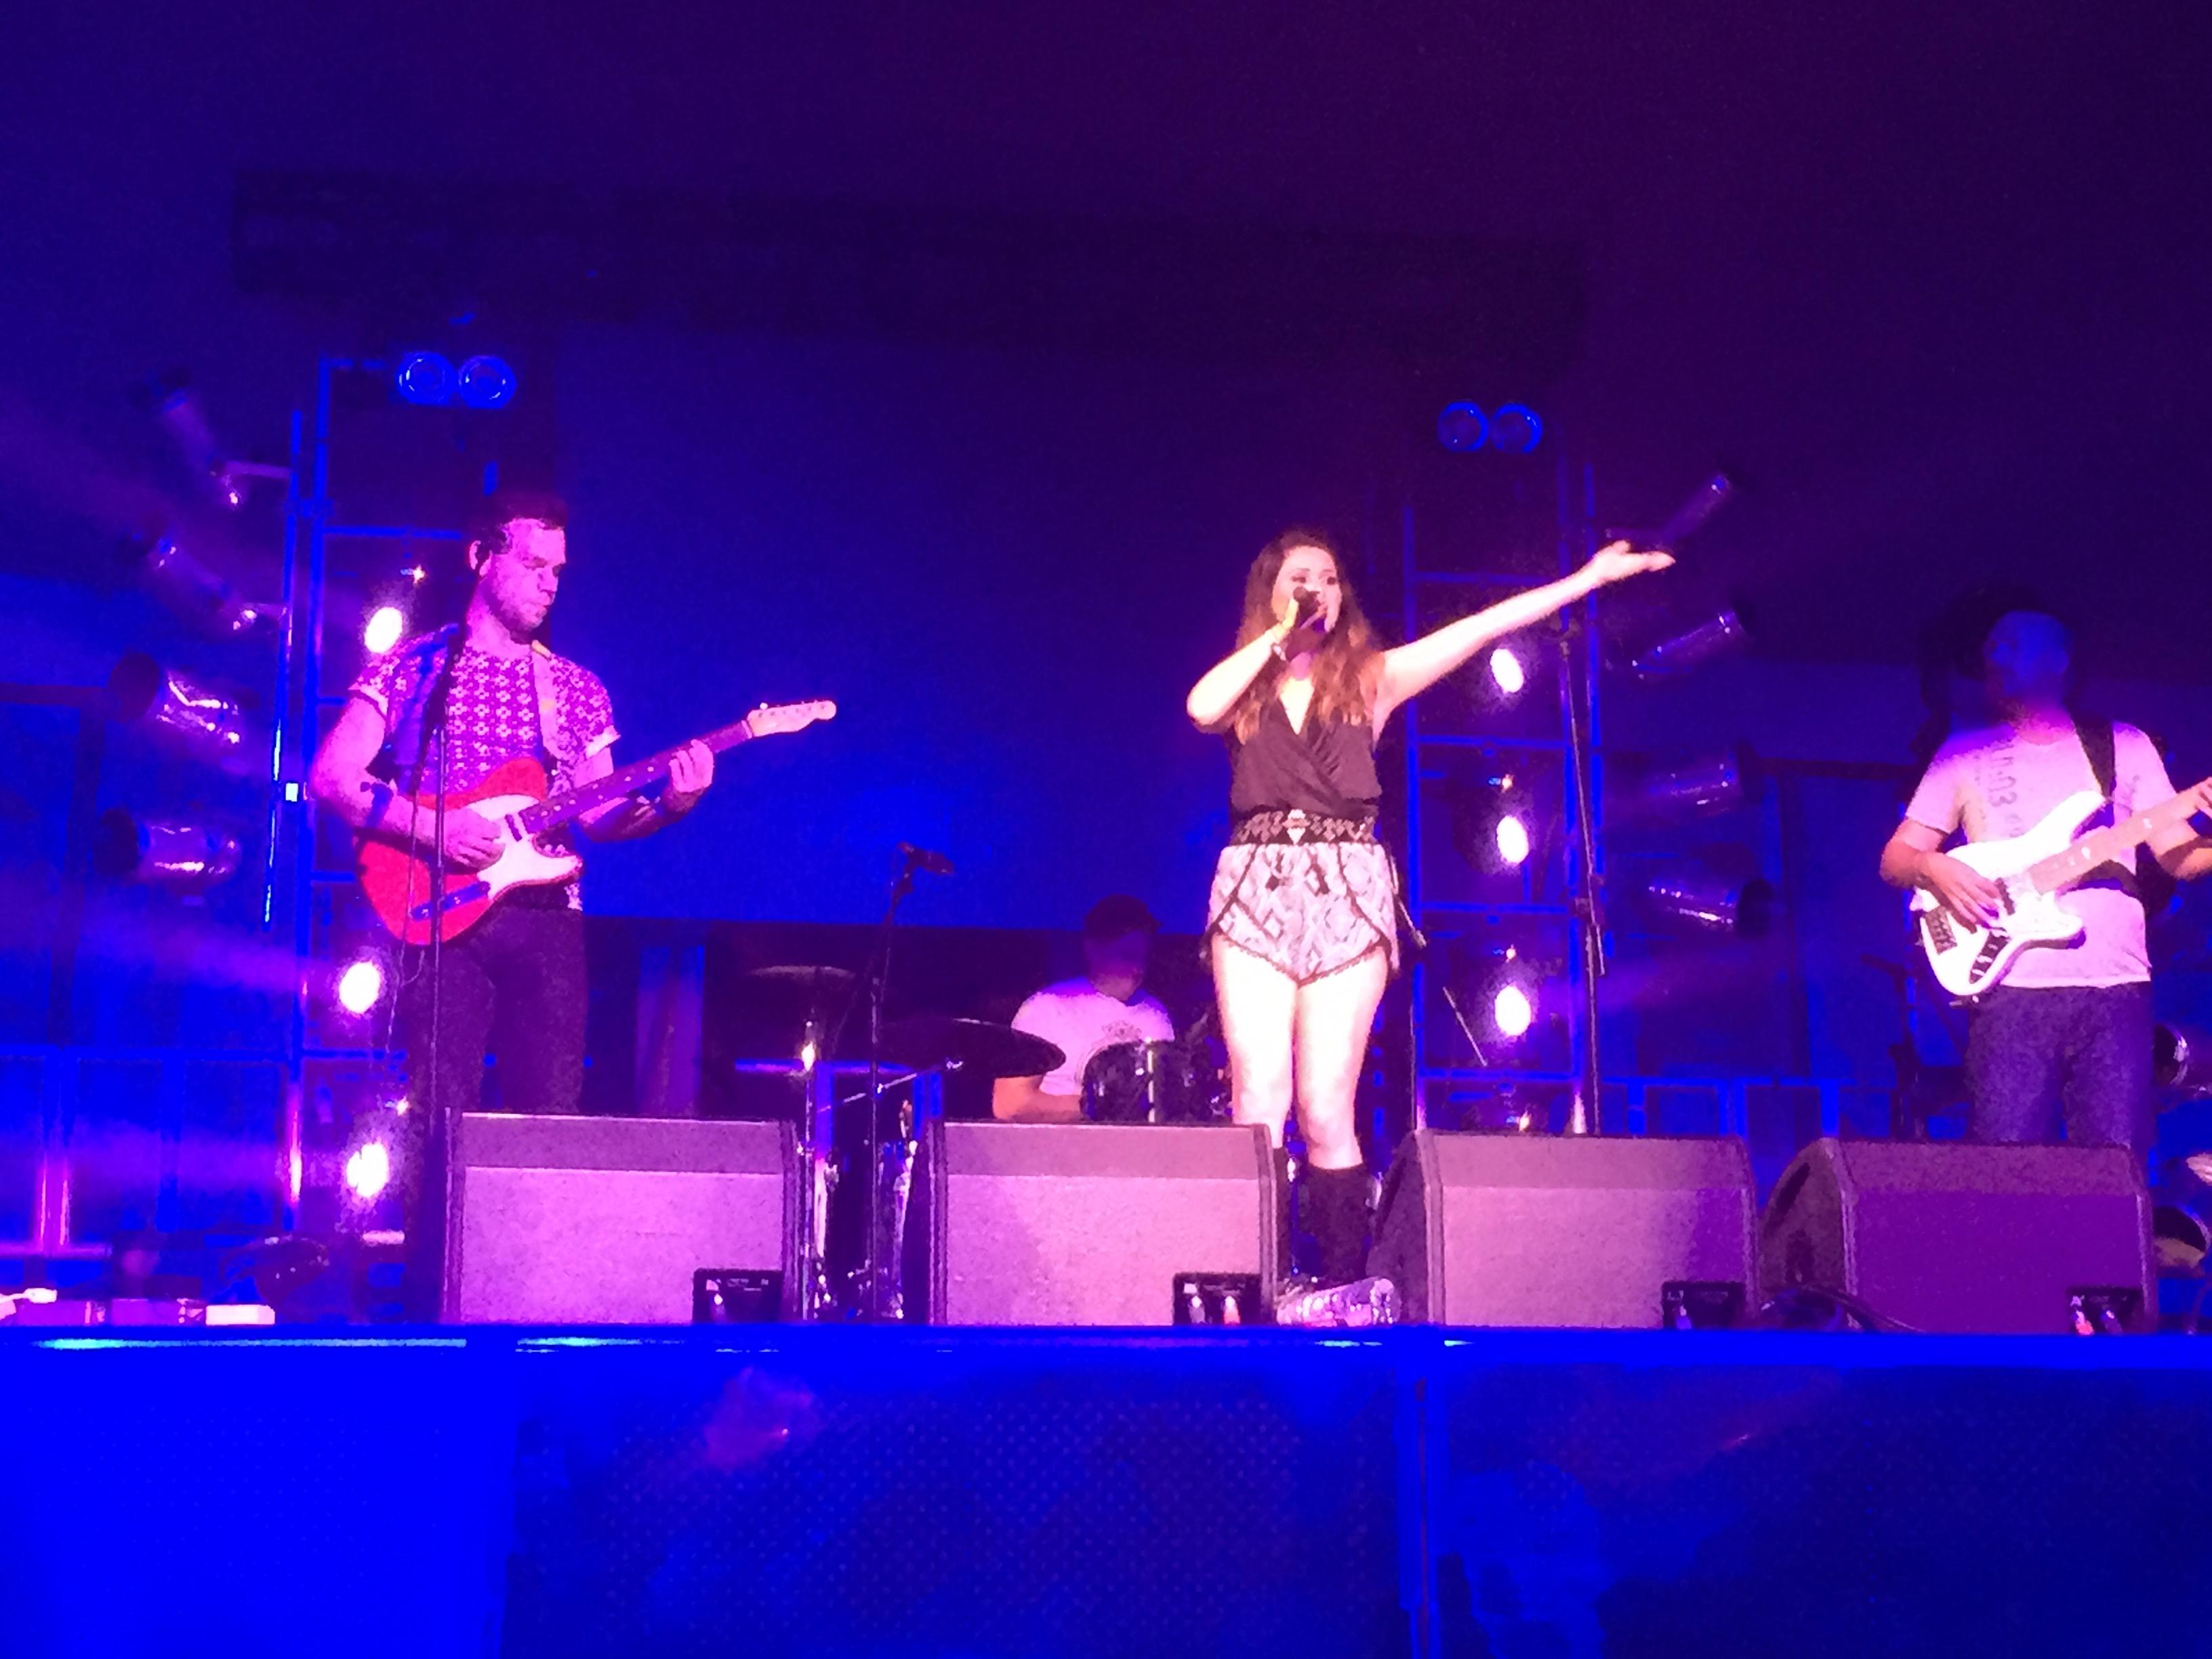 Frisco Live silverstone 2015